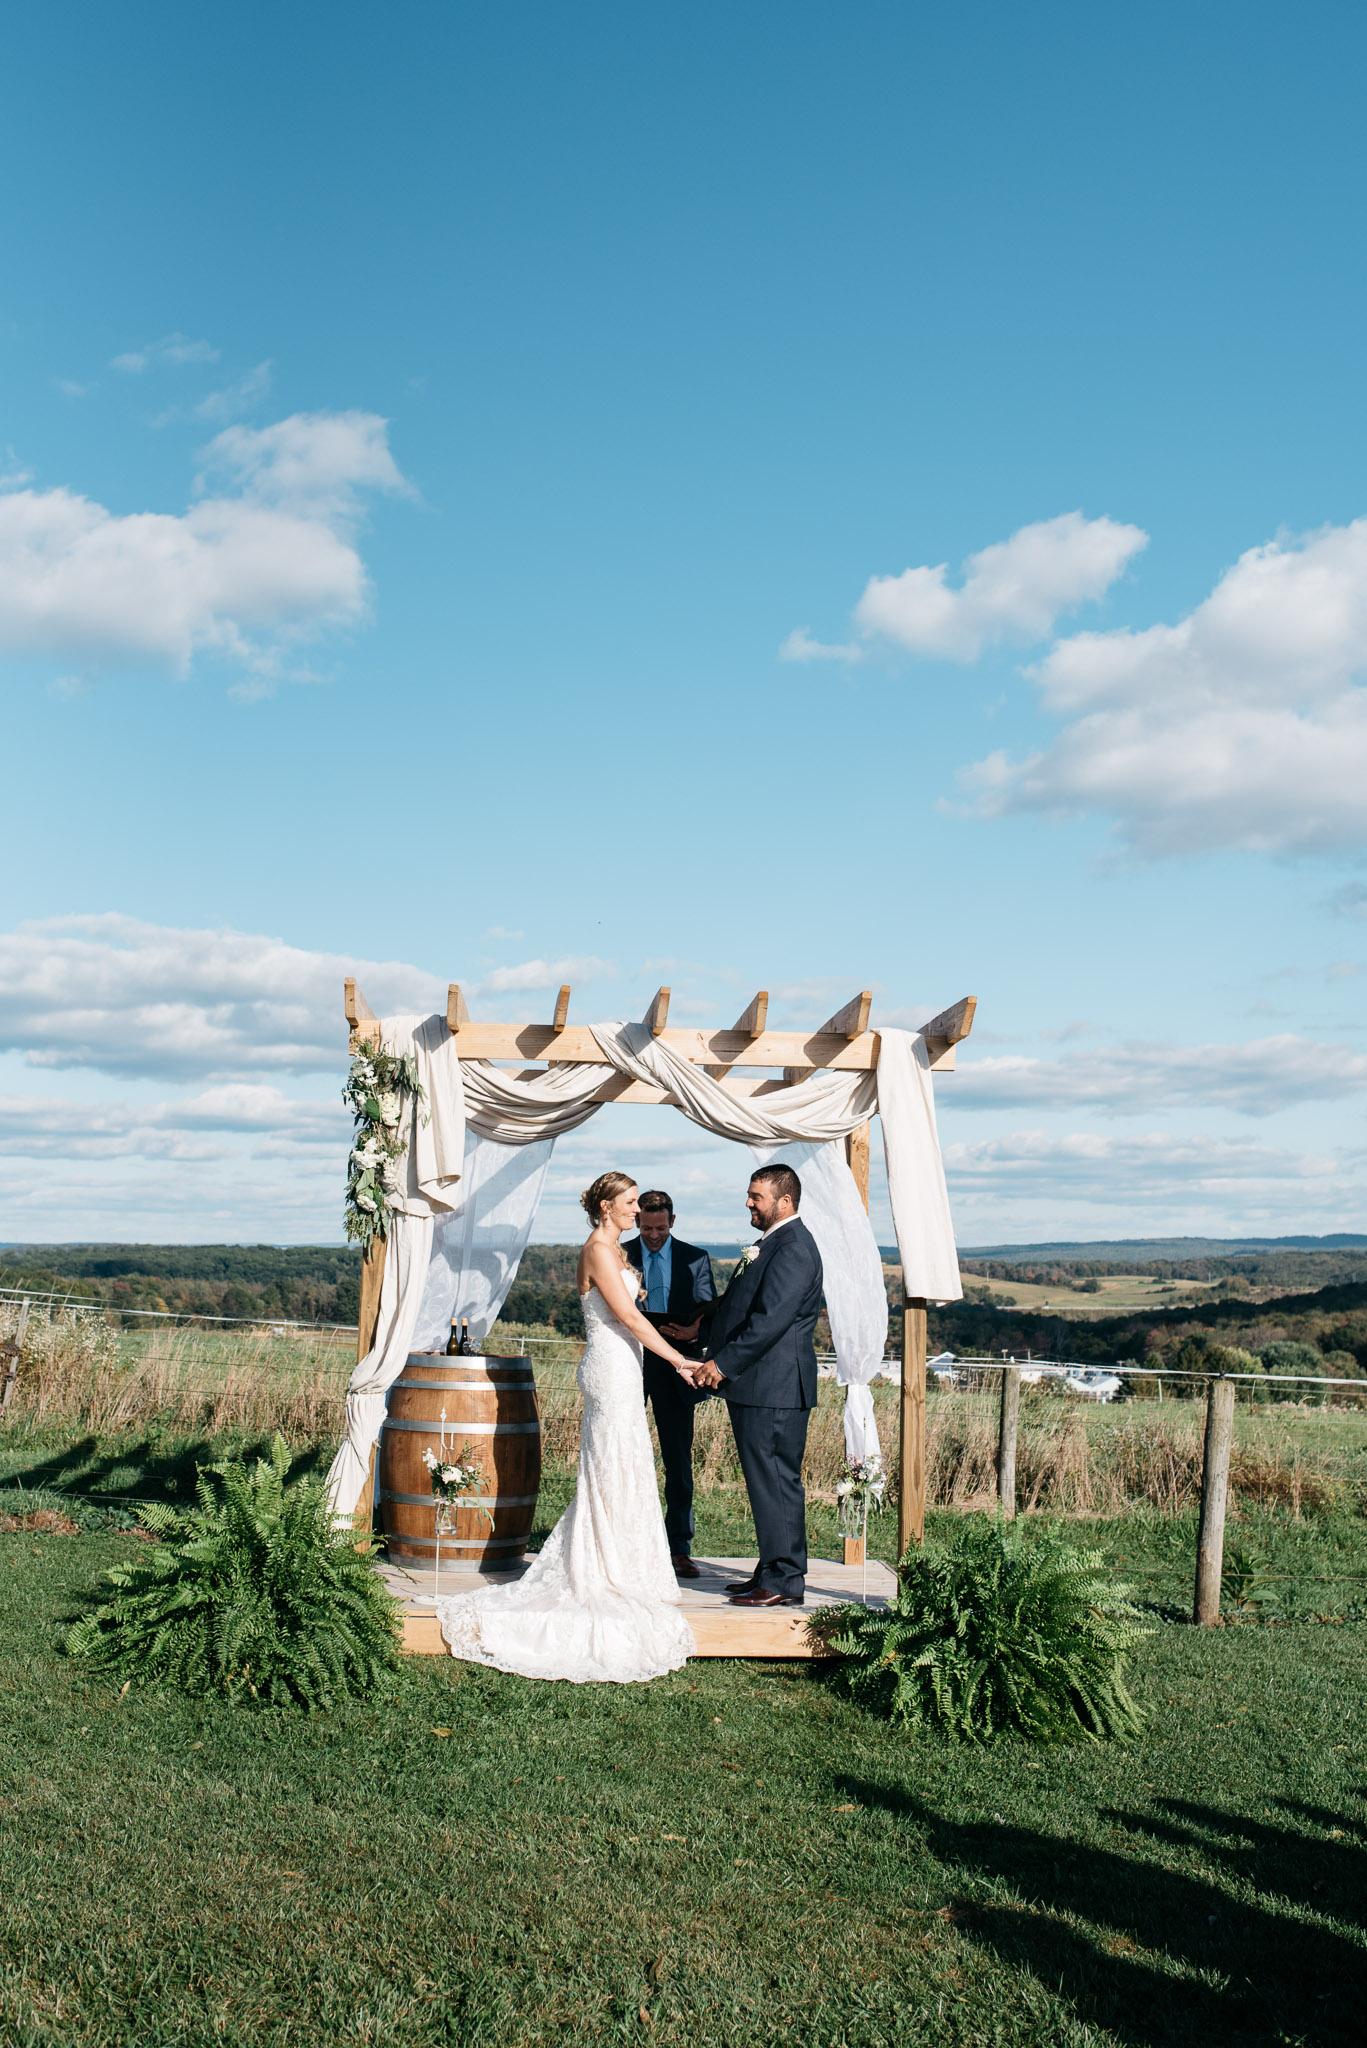 pittsburgh-ligonier-wedding-photographer-the-event-barn-at-highland-farms-15.jpg